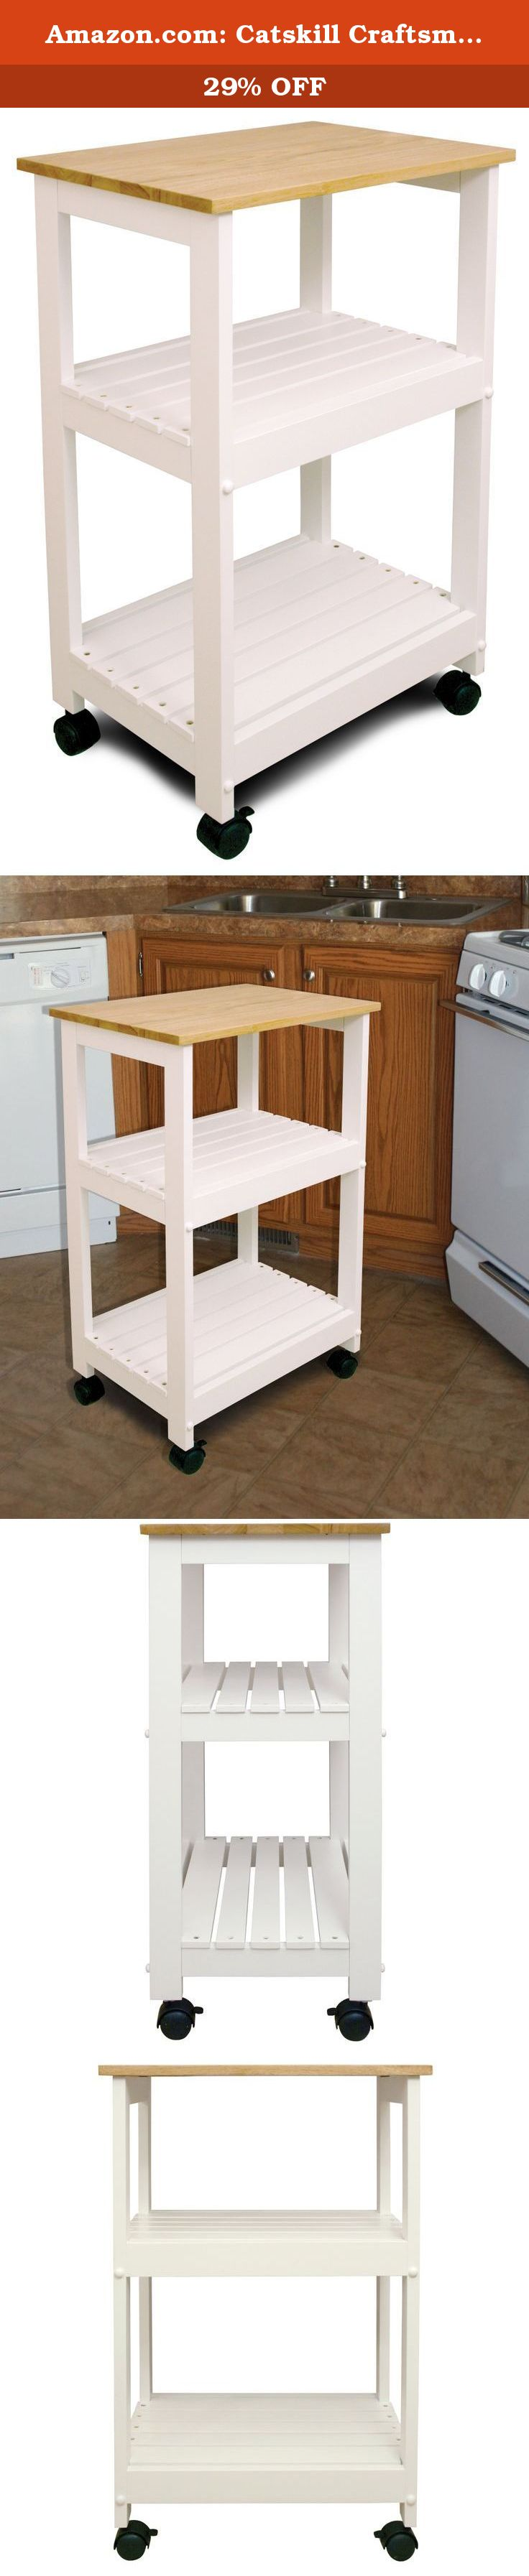 Amazon.com: Catskill Craftsmen Utility Kitchen Cart/Microwave Stand ...